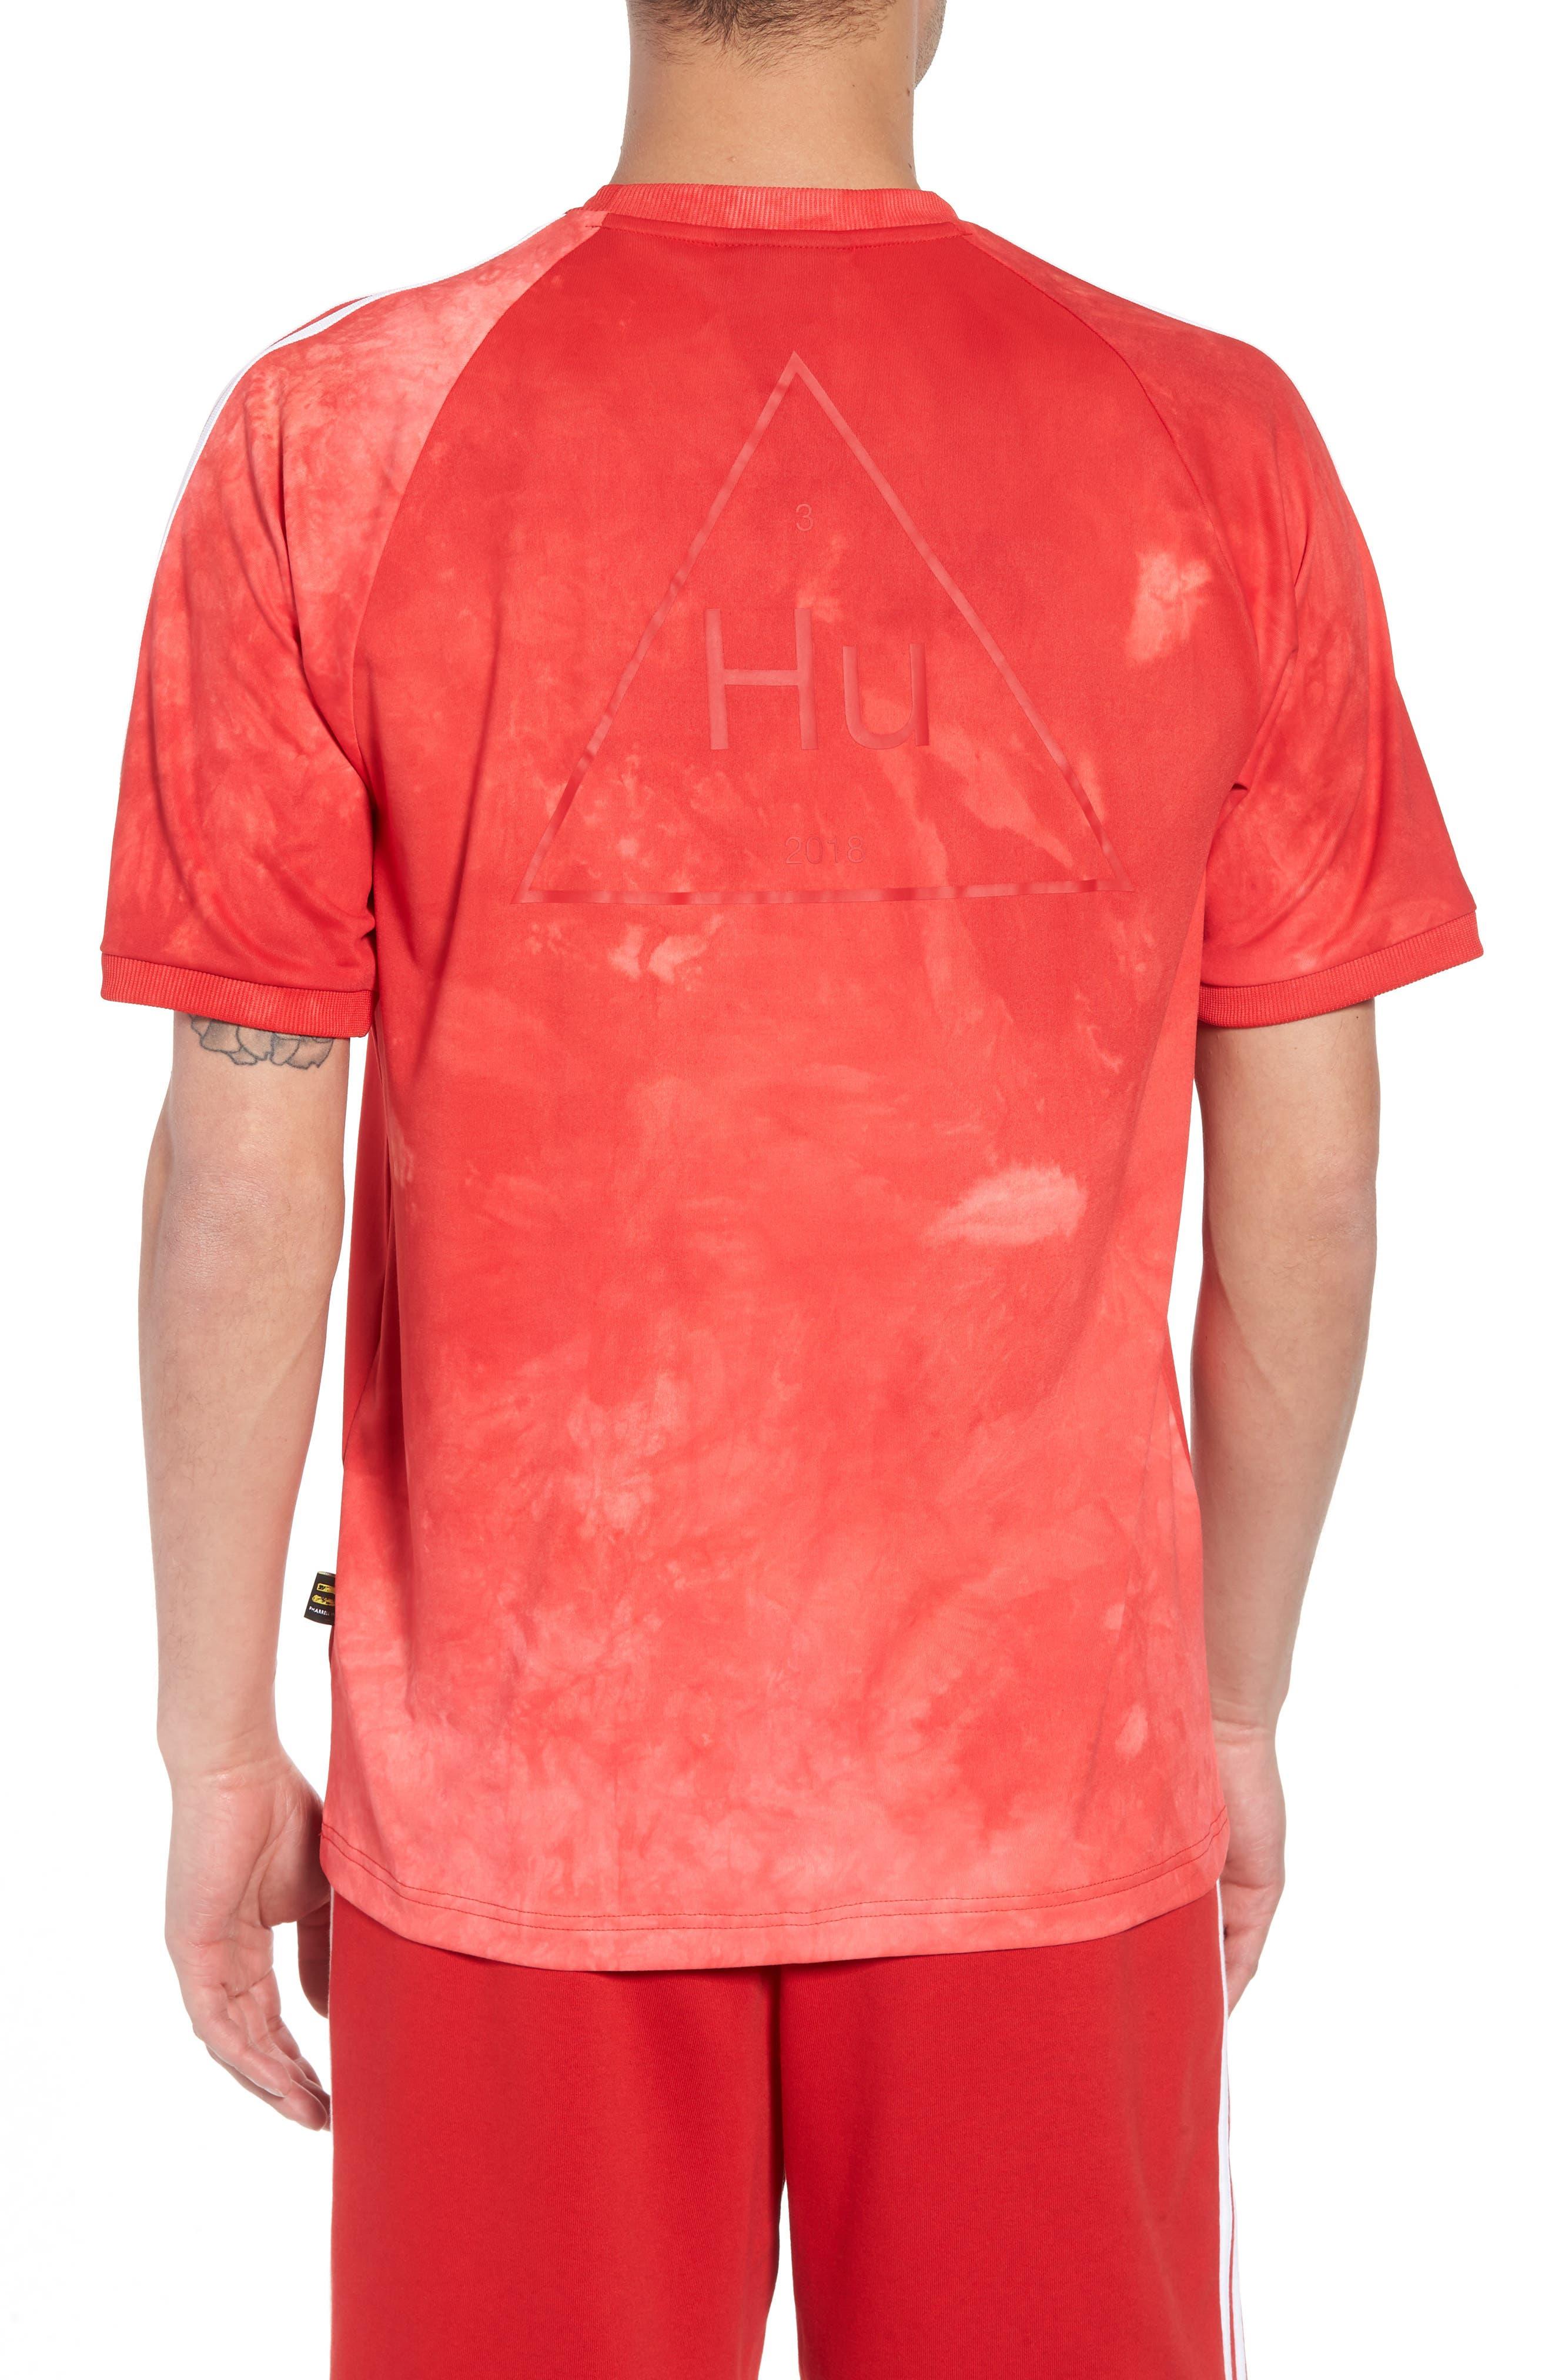 Hu Holi Soccer T-Shirt,                             Alternate thumbnail 2, color,                             Scarlet